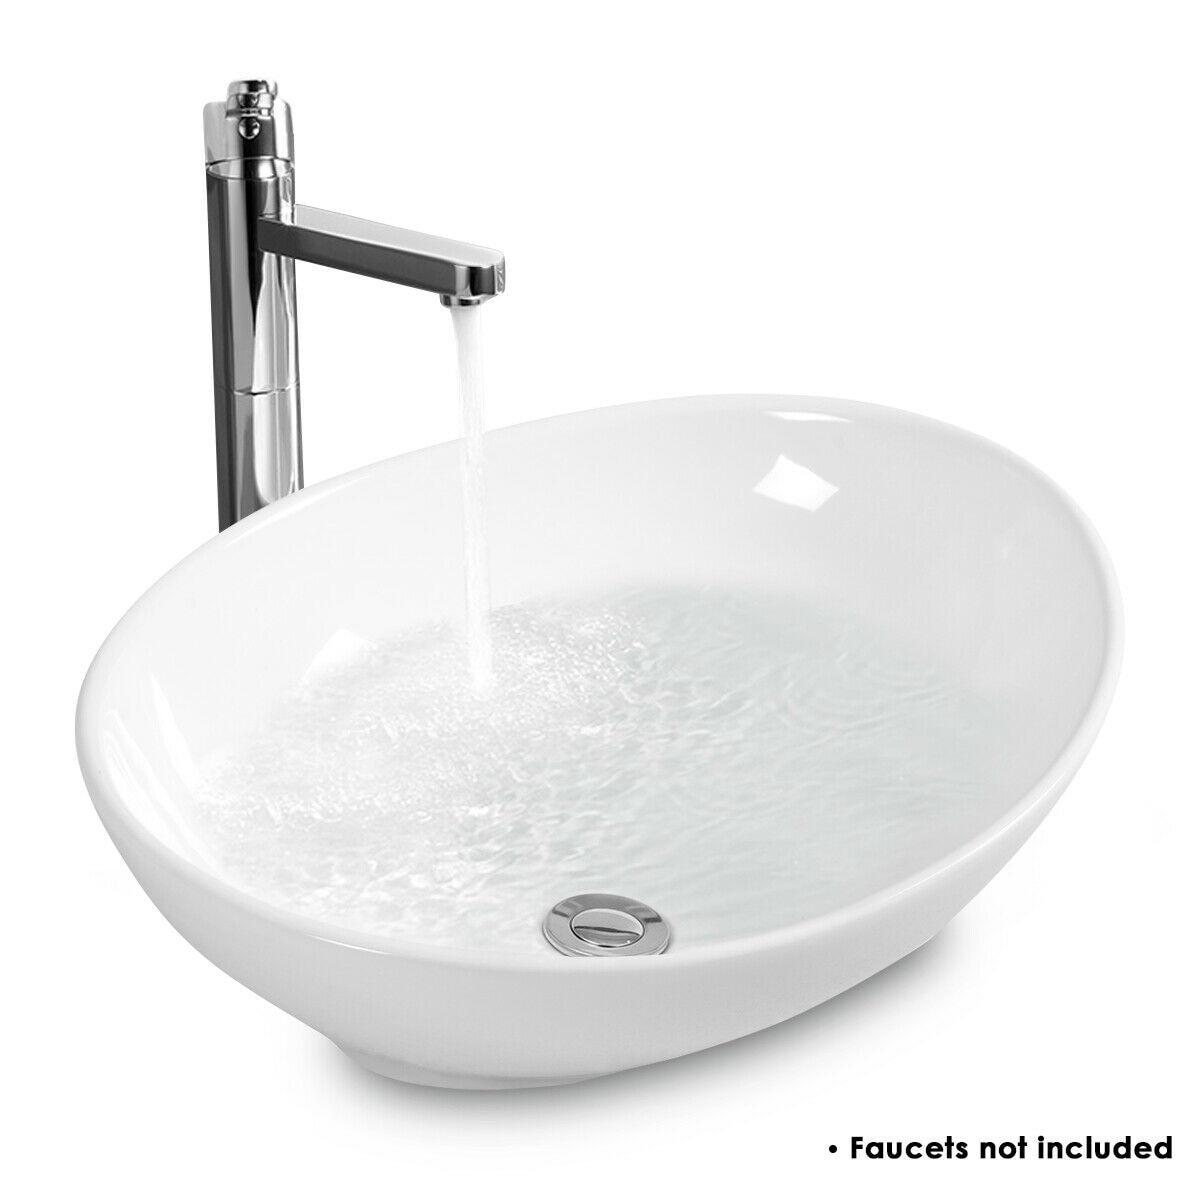 Modern Toilet White Oval Bathroom Wash Basin Ceramic Vessel Sink BA7146